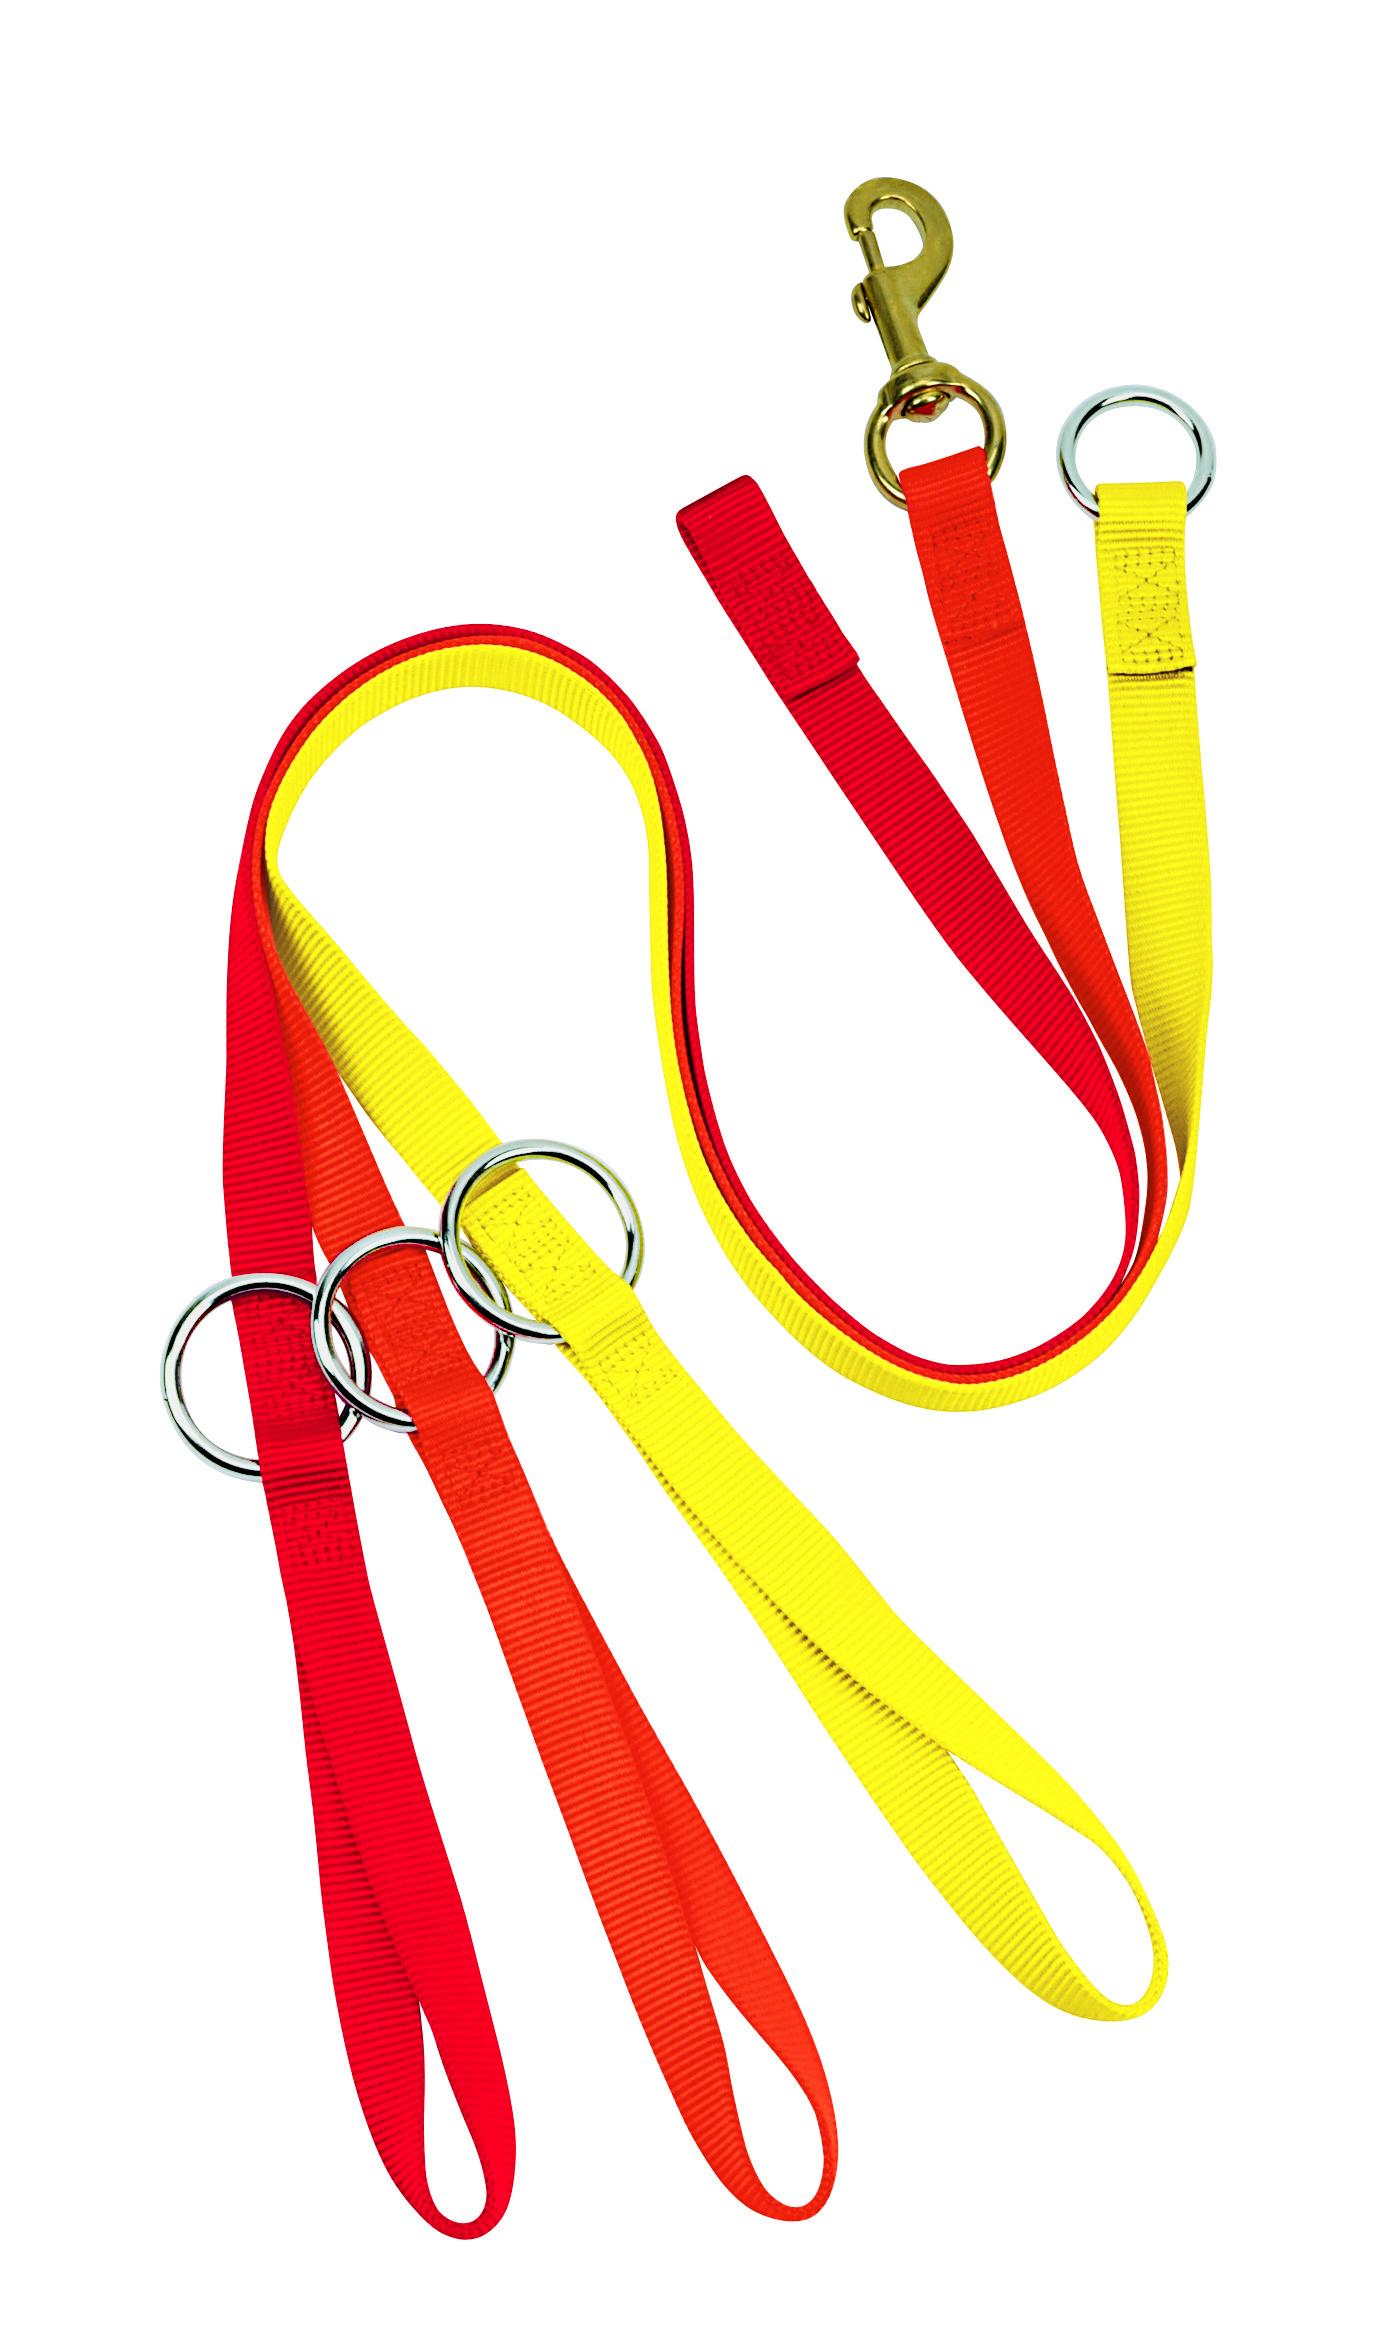 Adjustable Chain Saw Strap WE-08-98219-20-21